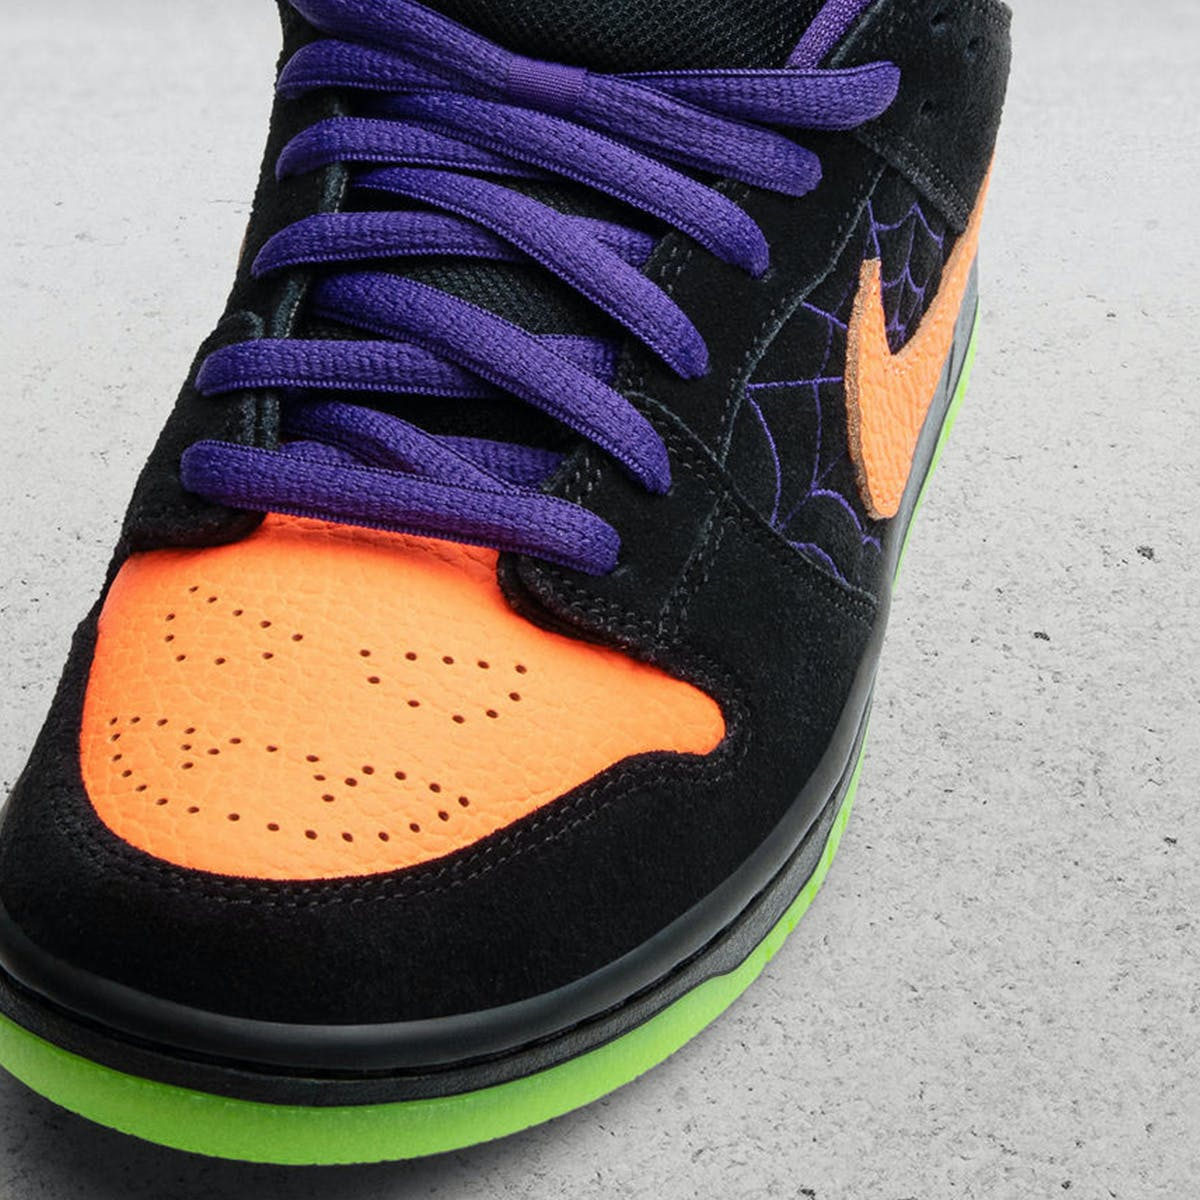 Nike SB Dunk Low Pro - BQ6817-006